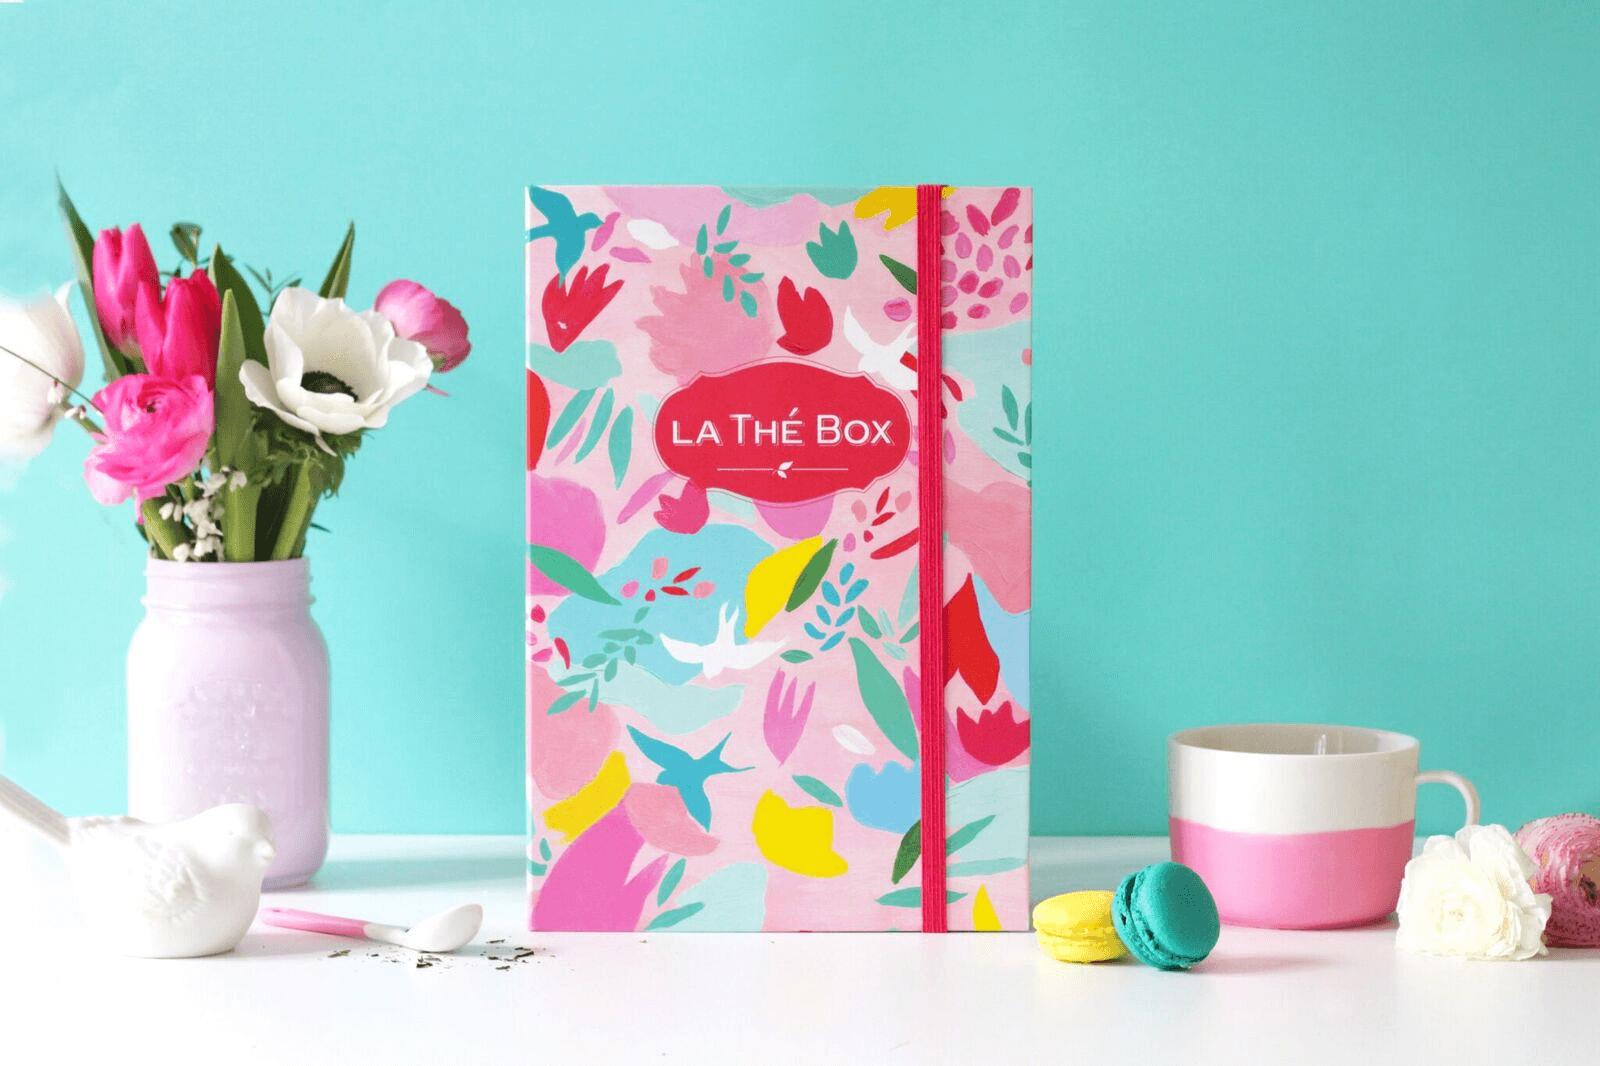 Image La Thé Box